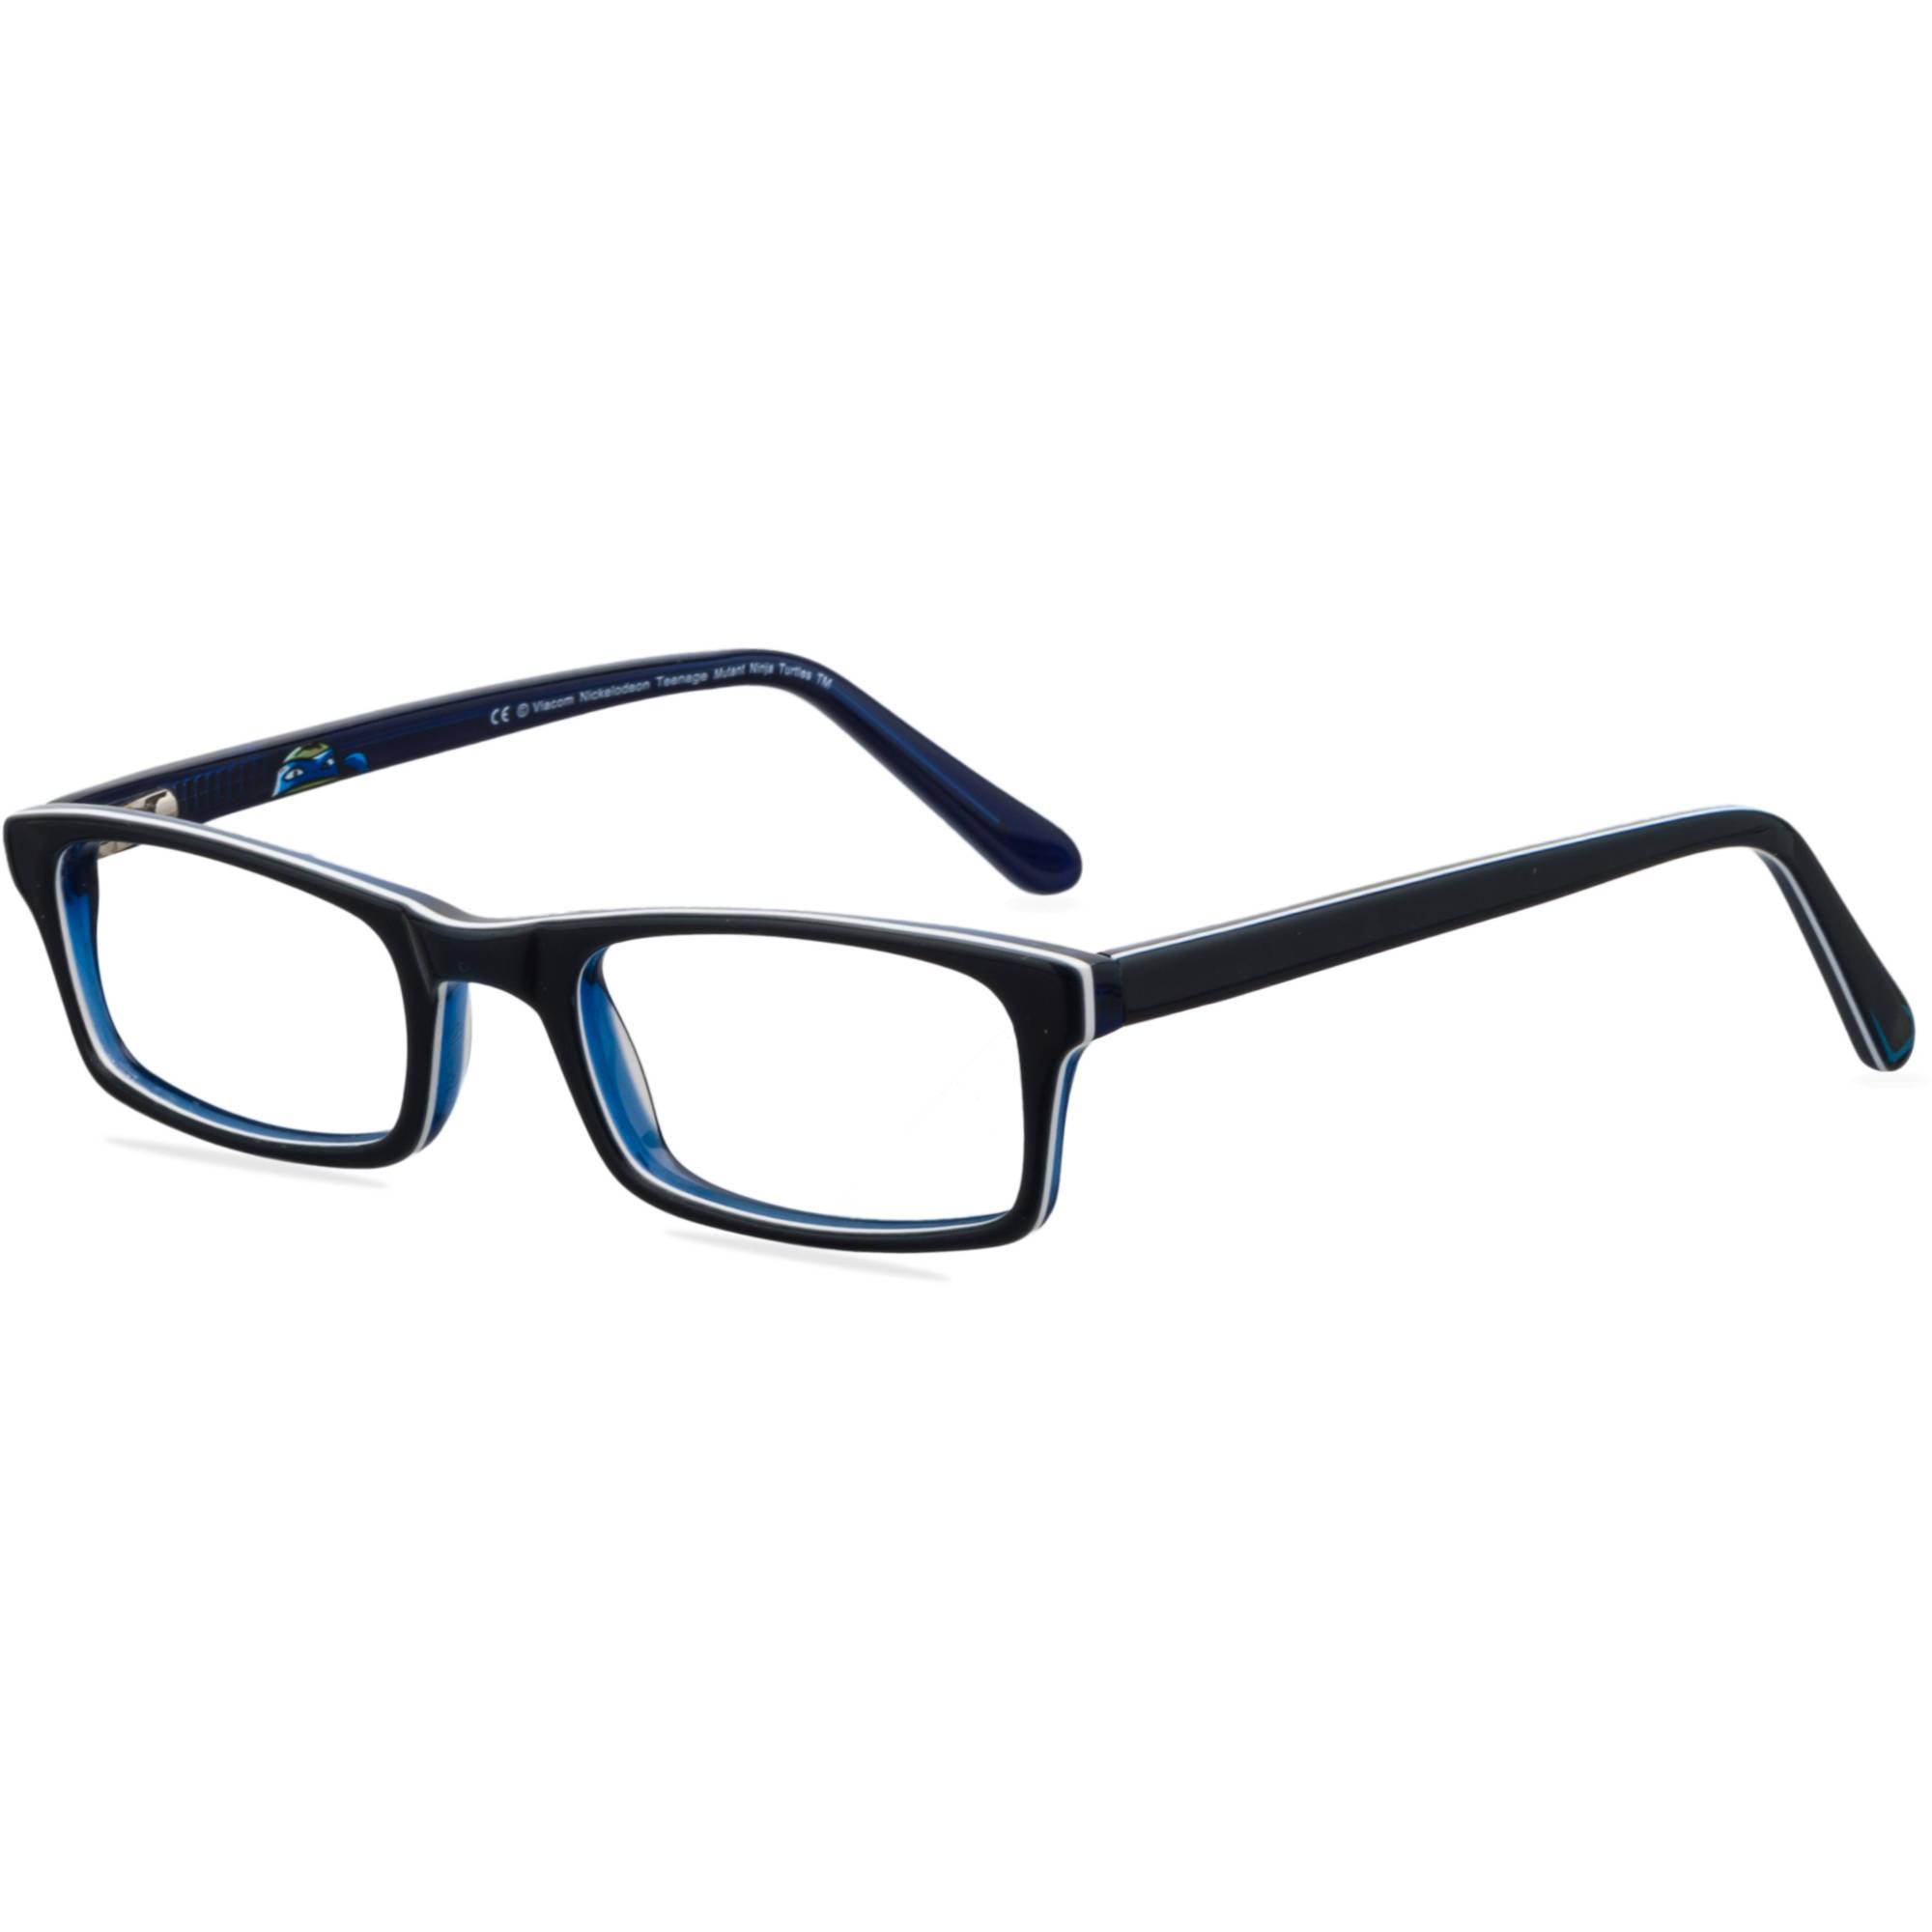 mutant turtles boys prescription glasses